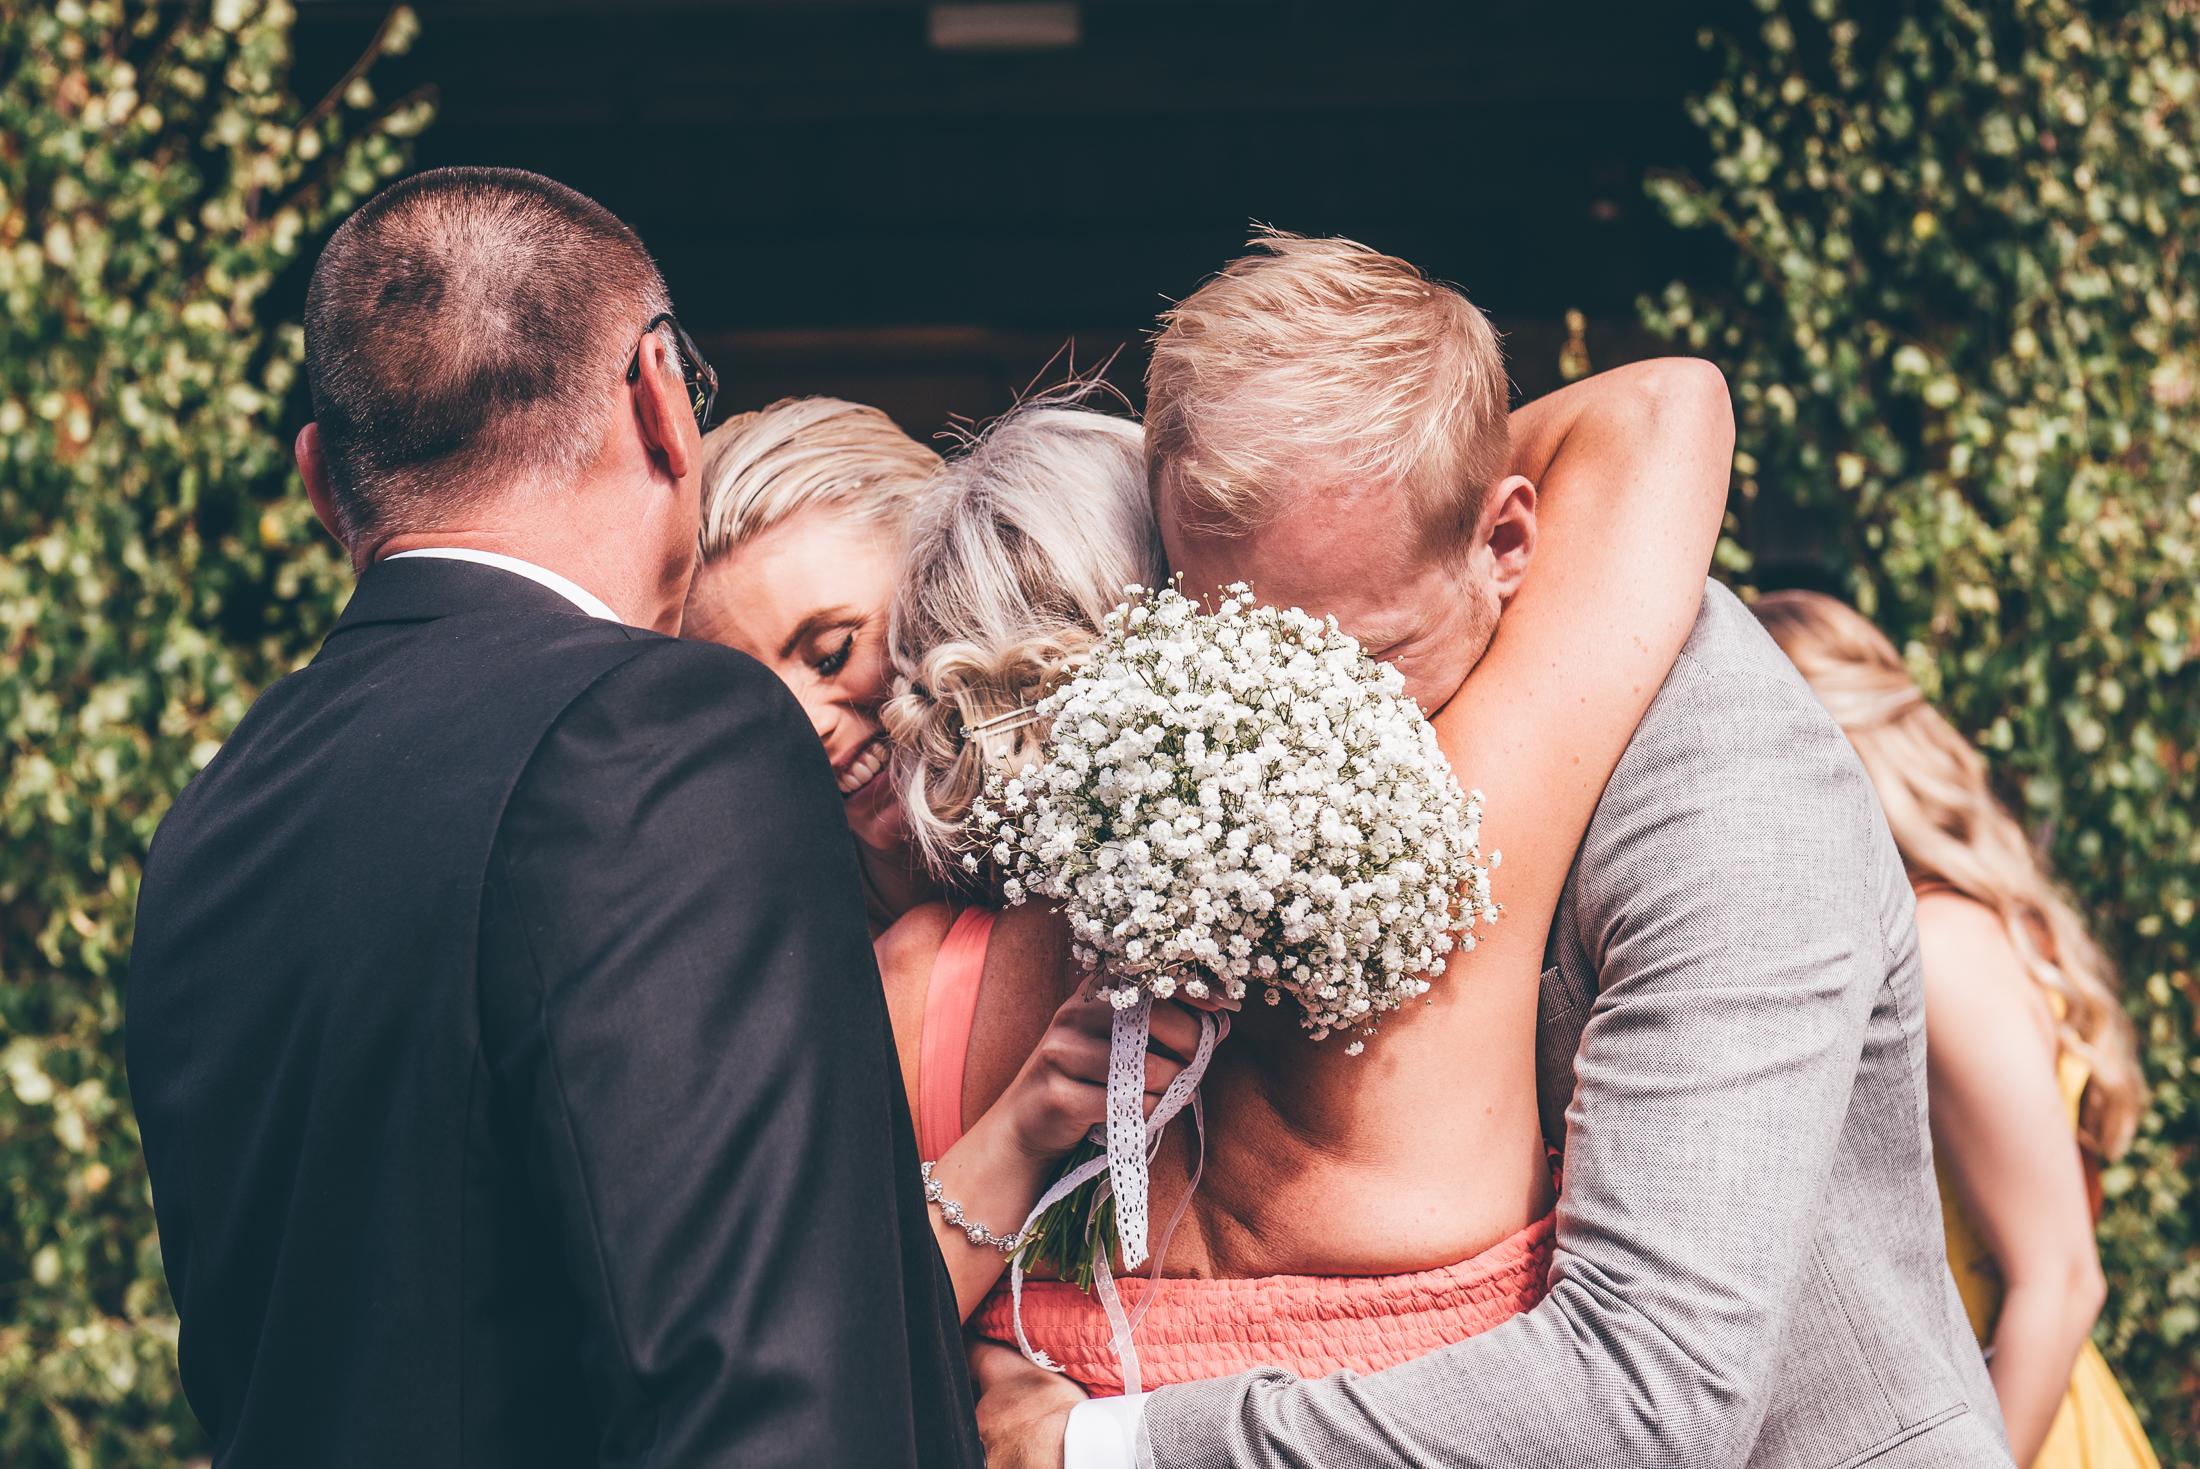 bröllop_linda_robin06.jpg